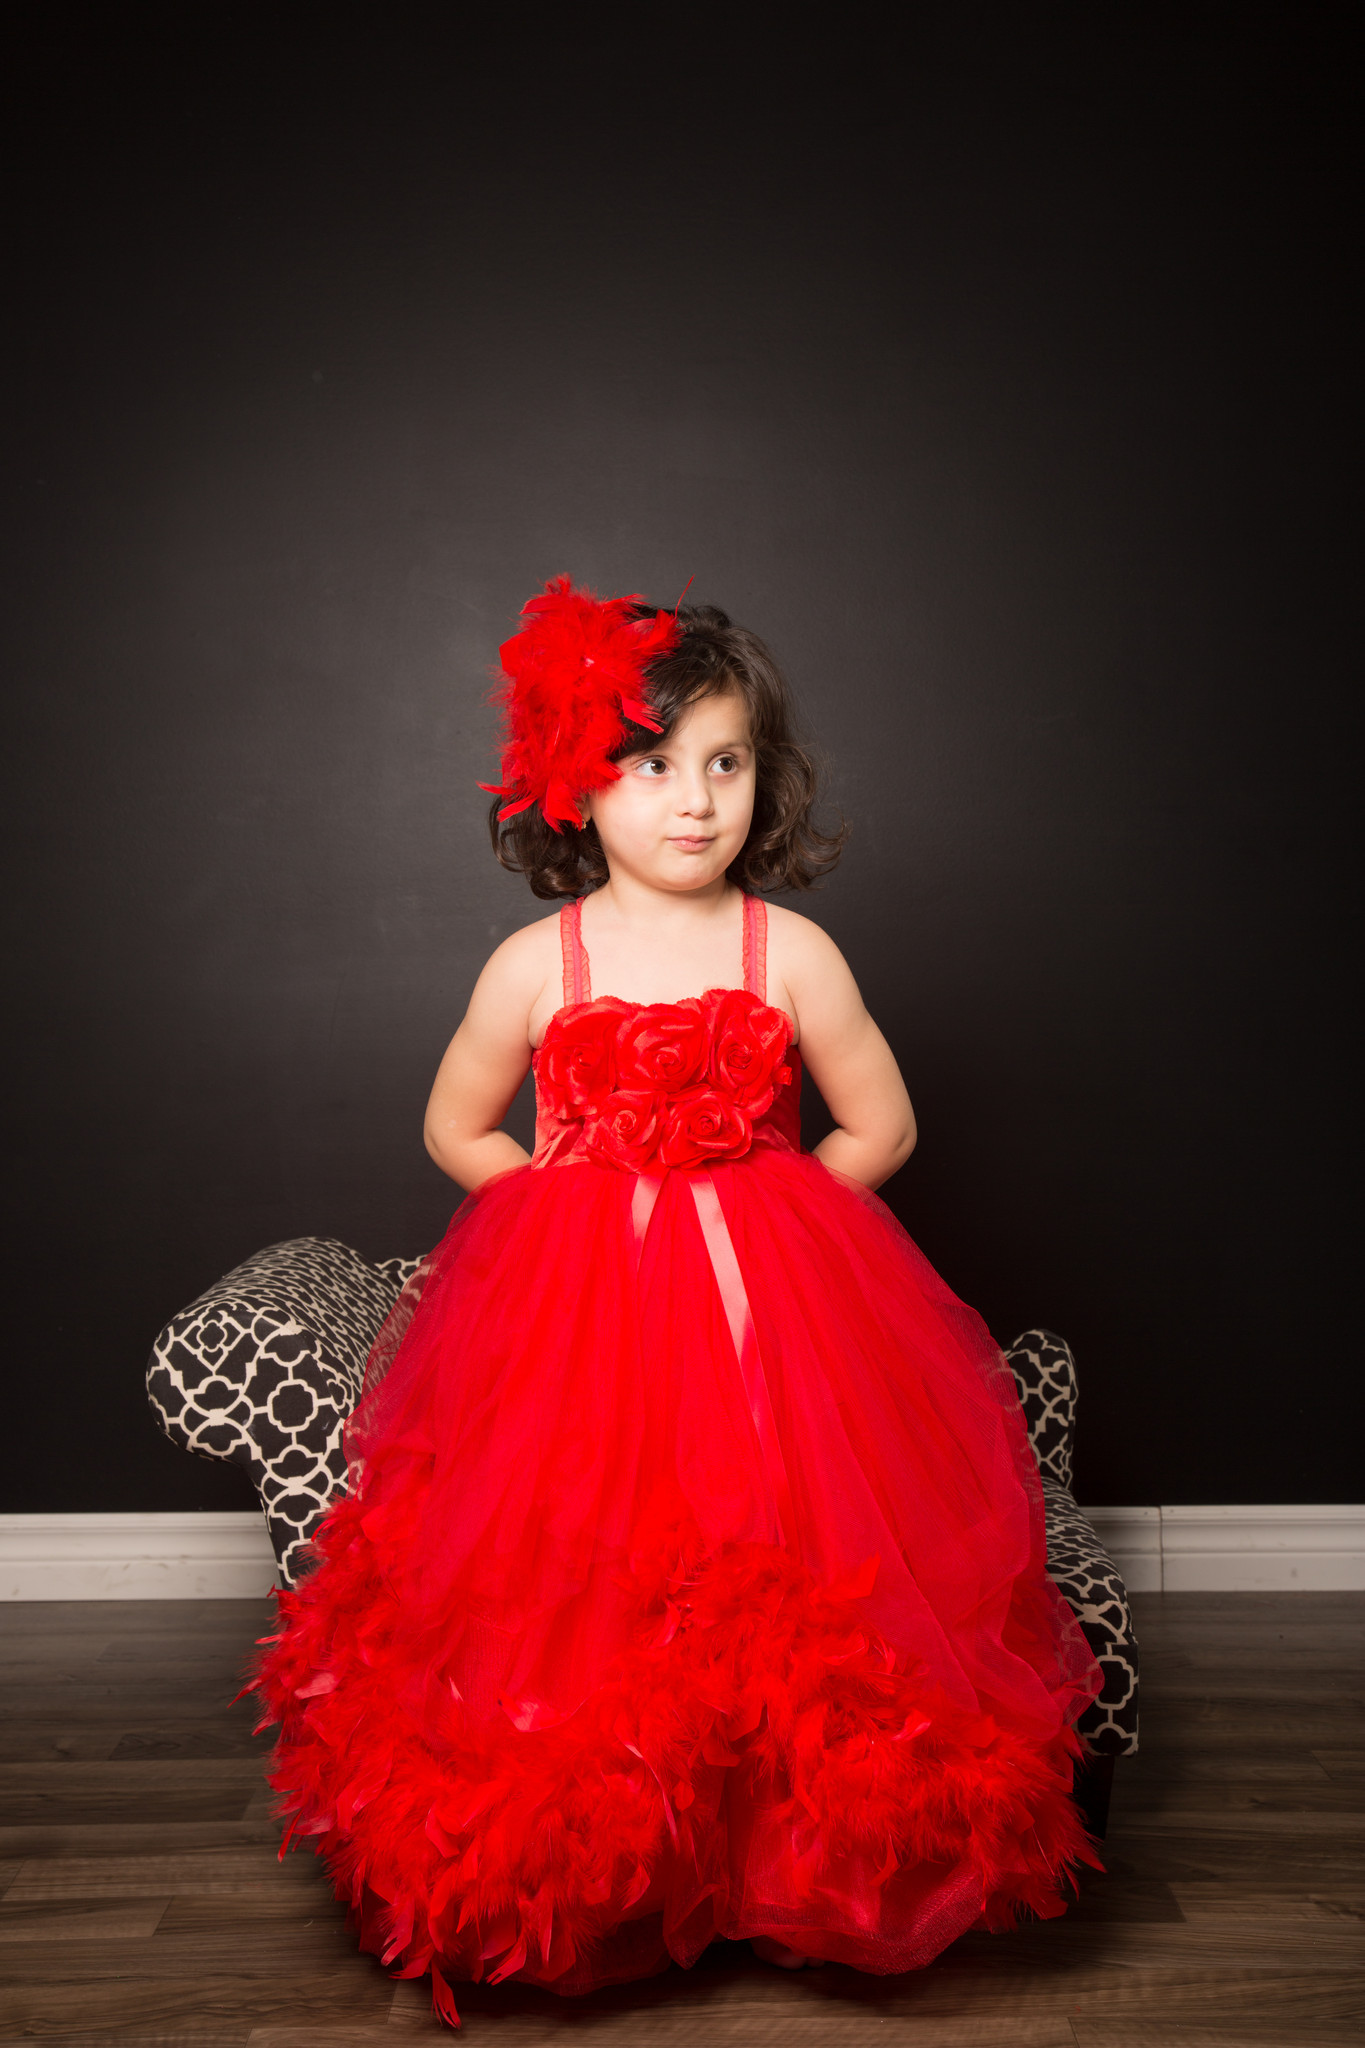 Tutu Dress Picture Collection Dressedupgirl Com